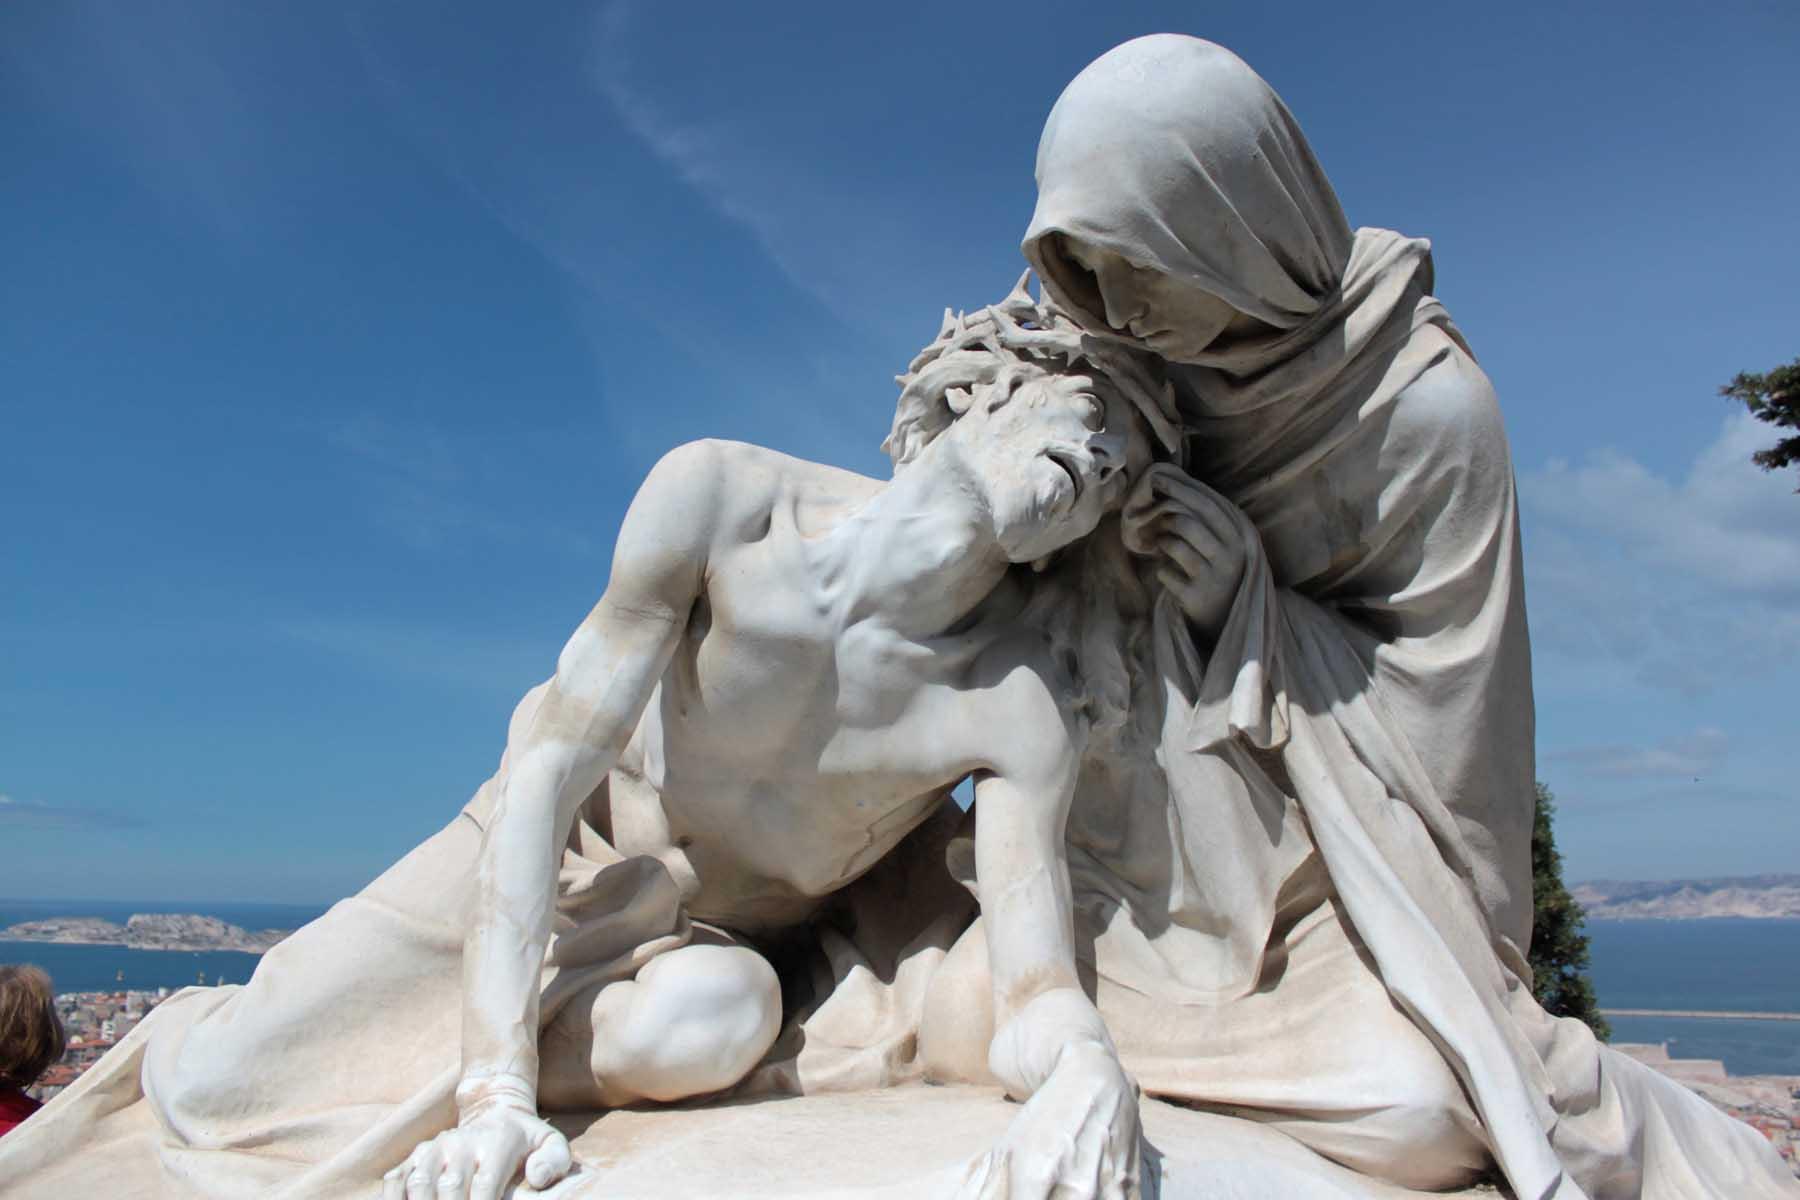 Pieta statue